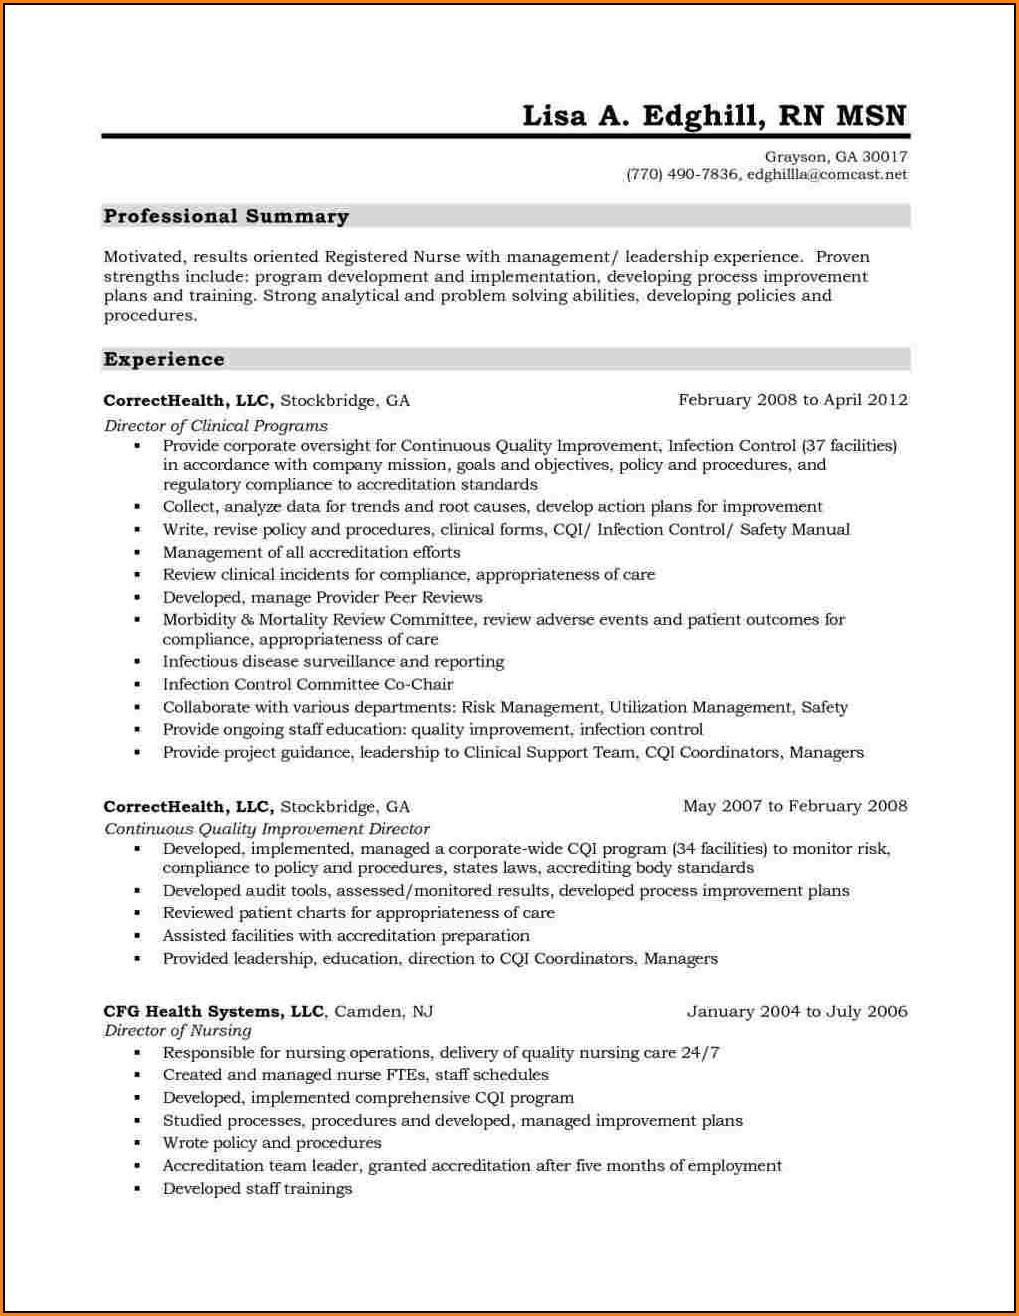 Resume For Registered Nurse Canada